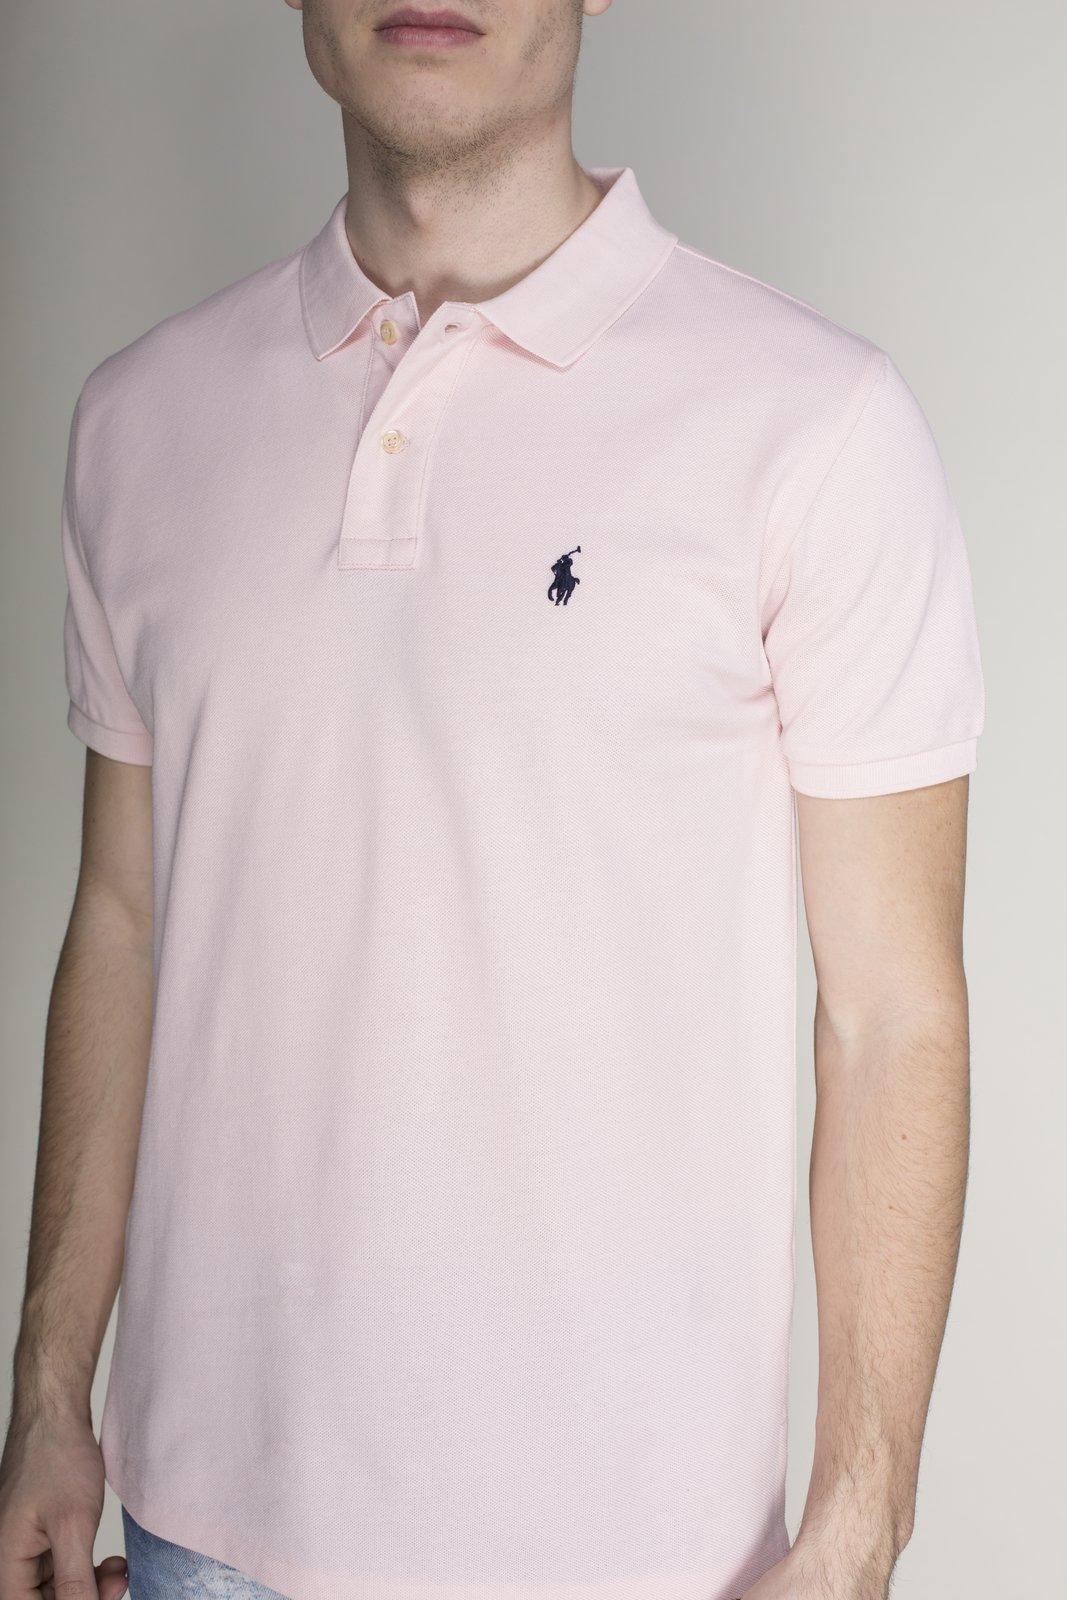 Футболка-поло рожева | 4113124 | фото 3